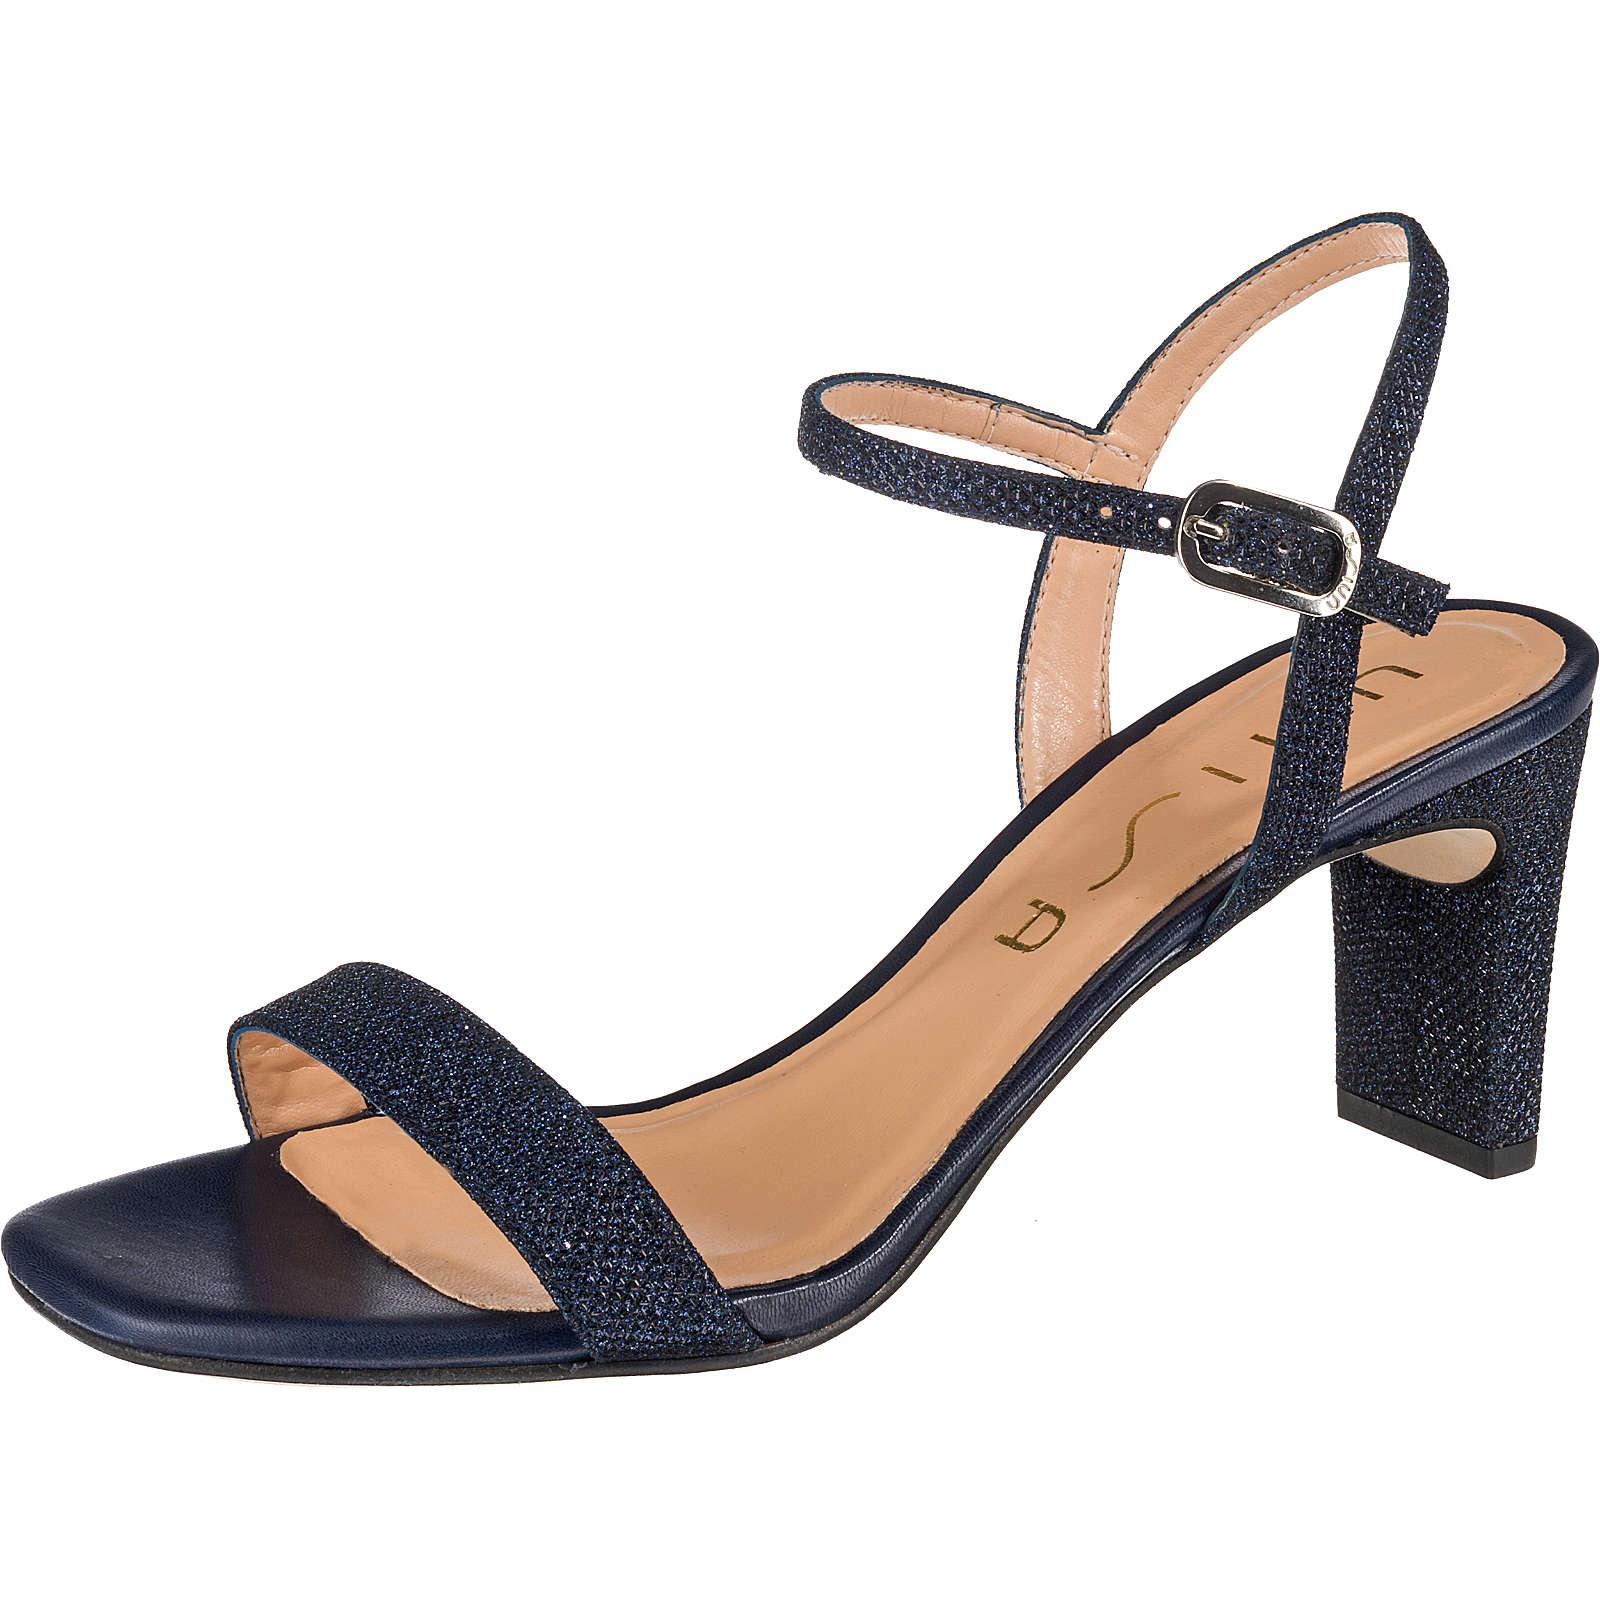 Unisa Klassische Sandaletten blau Damen Gr. 42